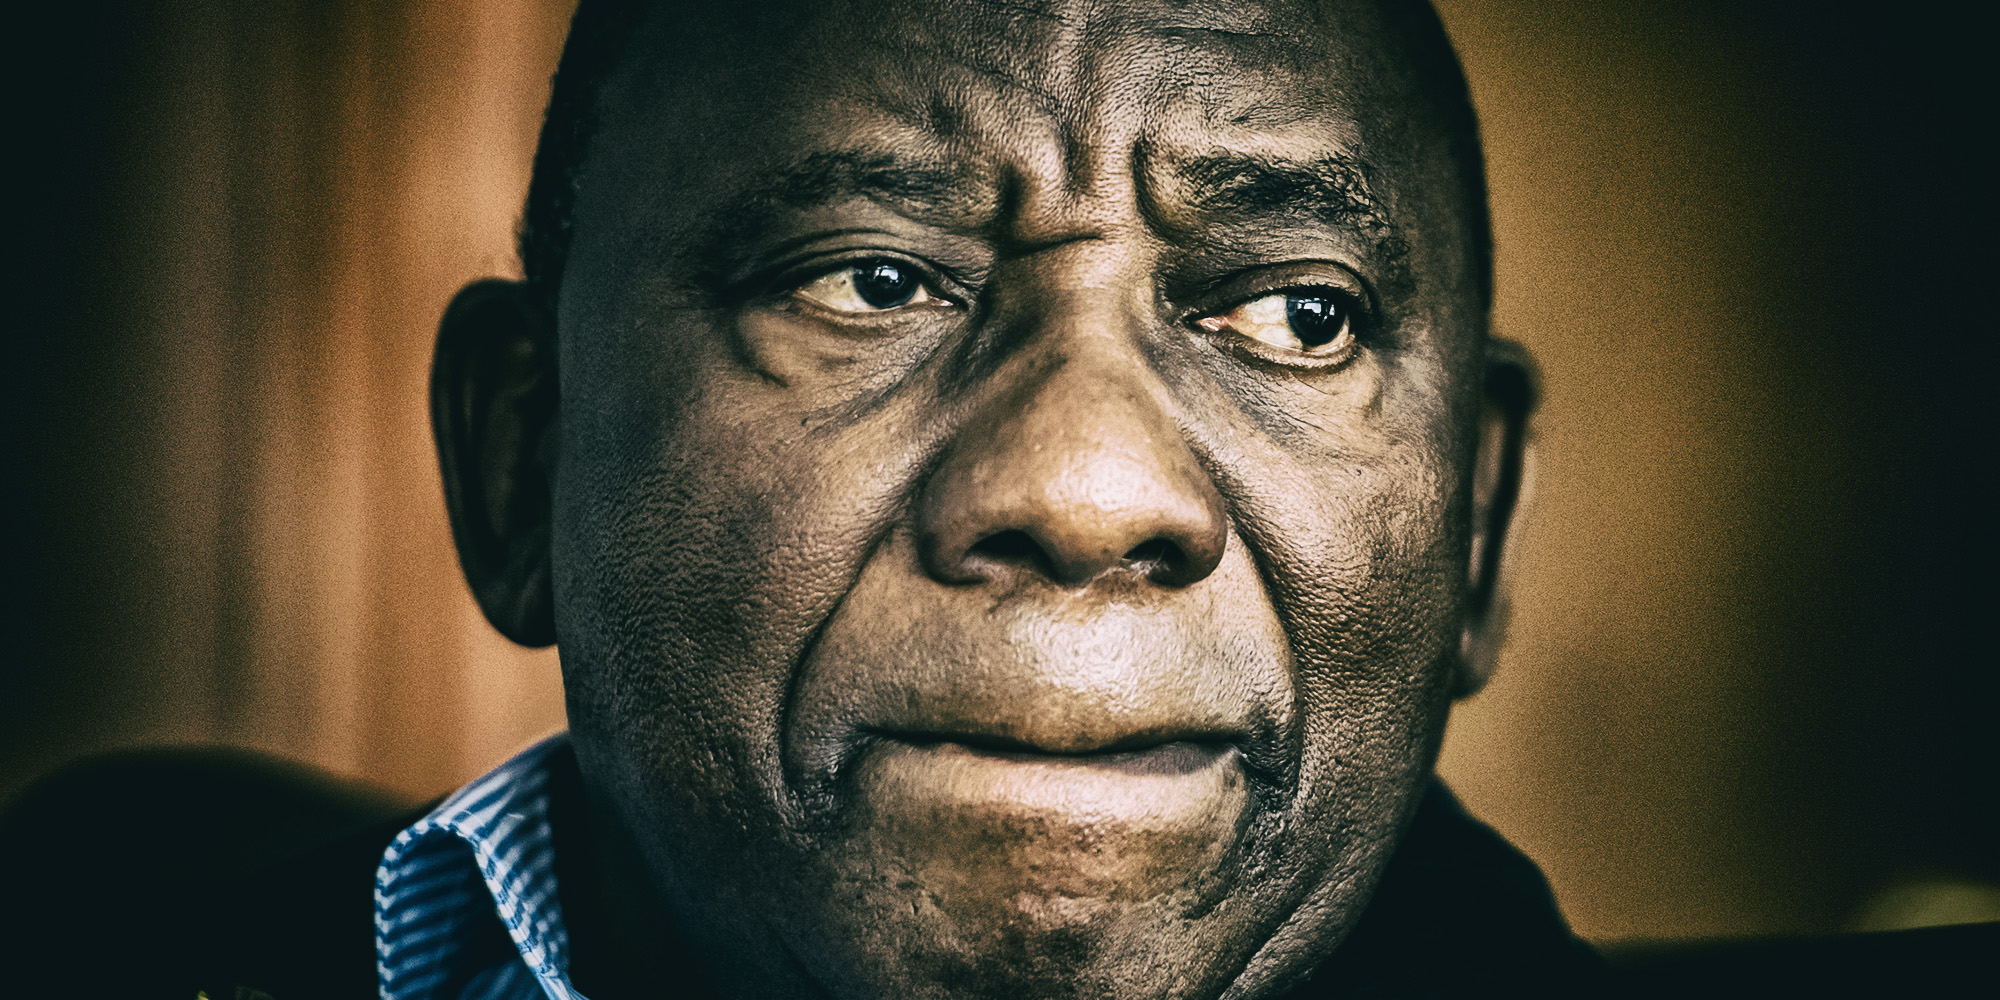 Ramaphosa must rebuild trust in the public service - Daily Maverick